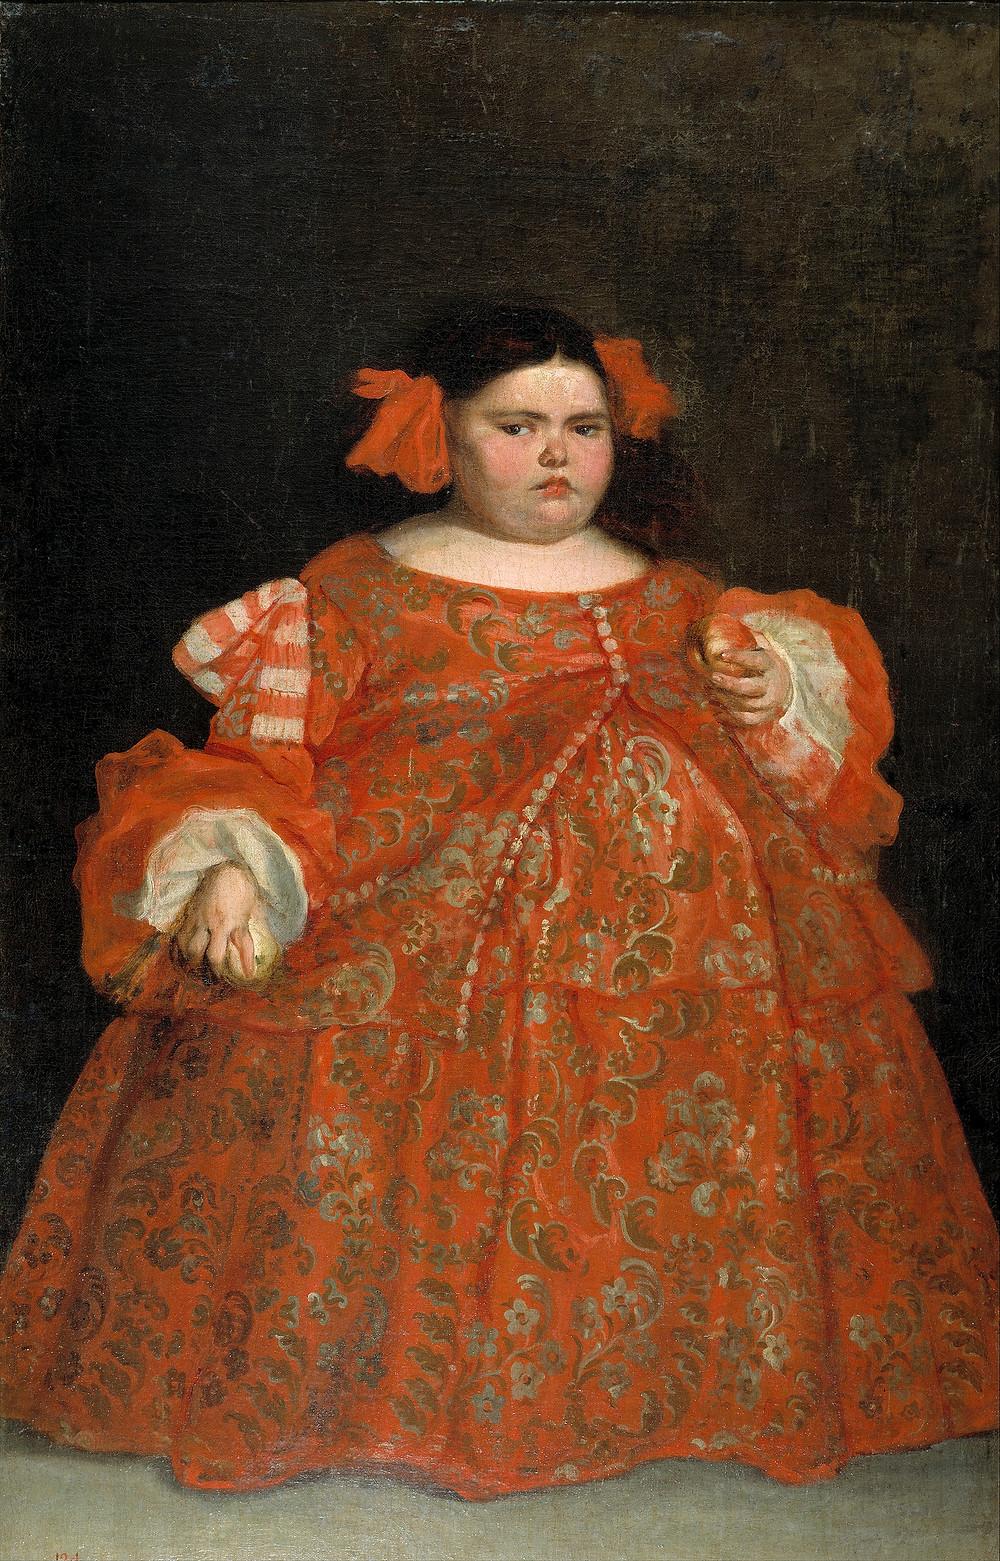 Eugenia Martínez Vallejo / Museo Nacional del Prado. Sanatçı: Juan Carreño de Miranda / Wikimedia Commons